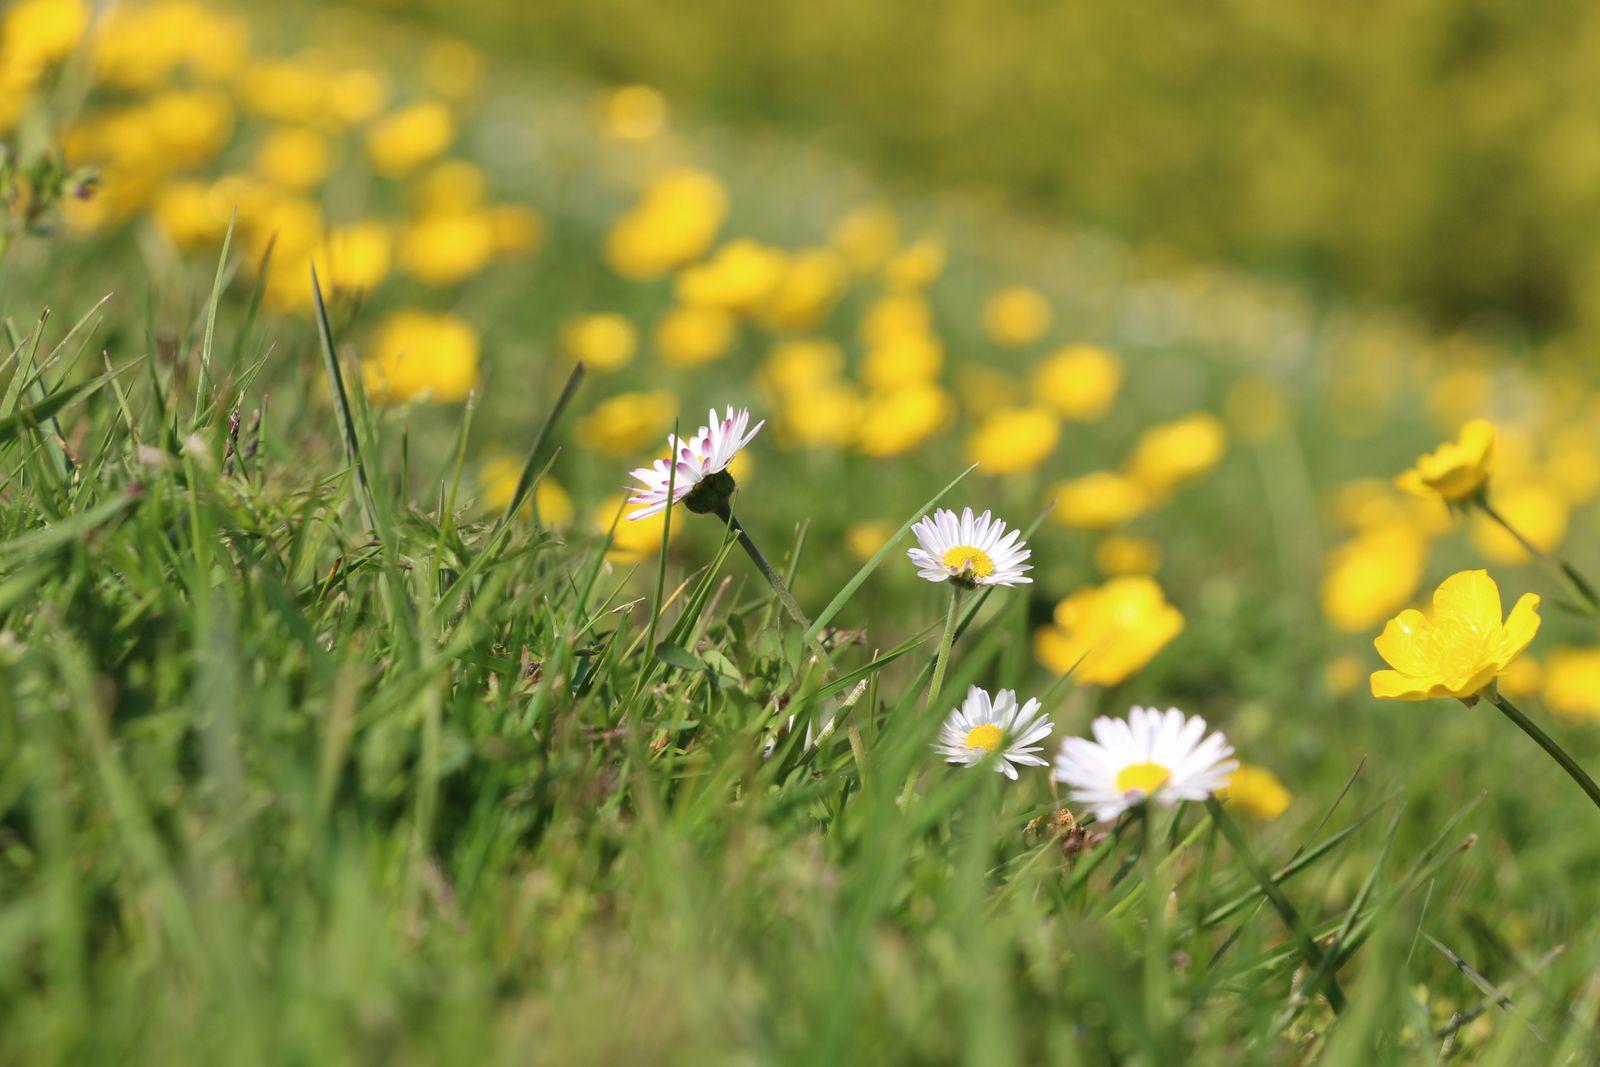 Dans mon jardin, printemps Saint-Urbain (Vendée), 8 avril 2020 © eMmA MessanA